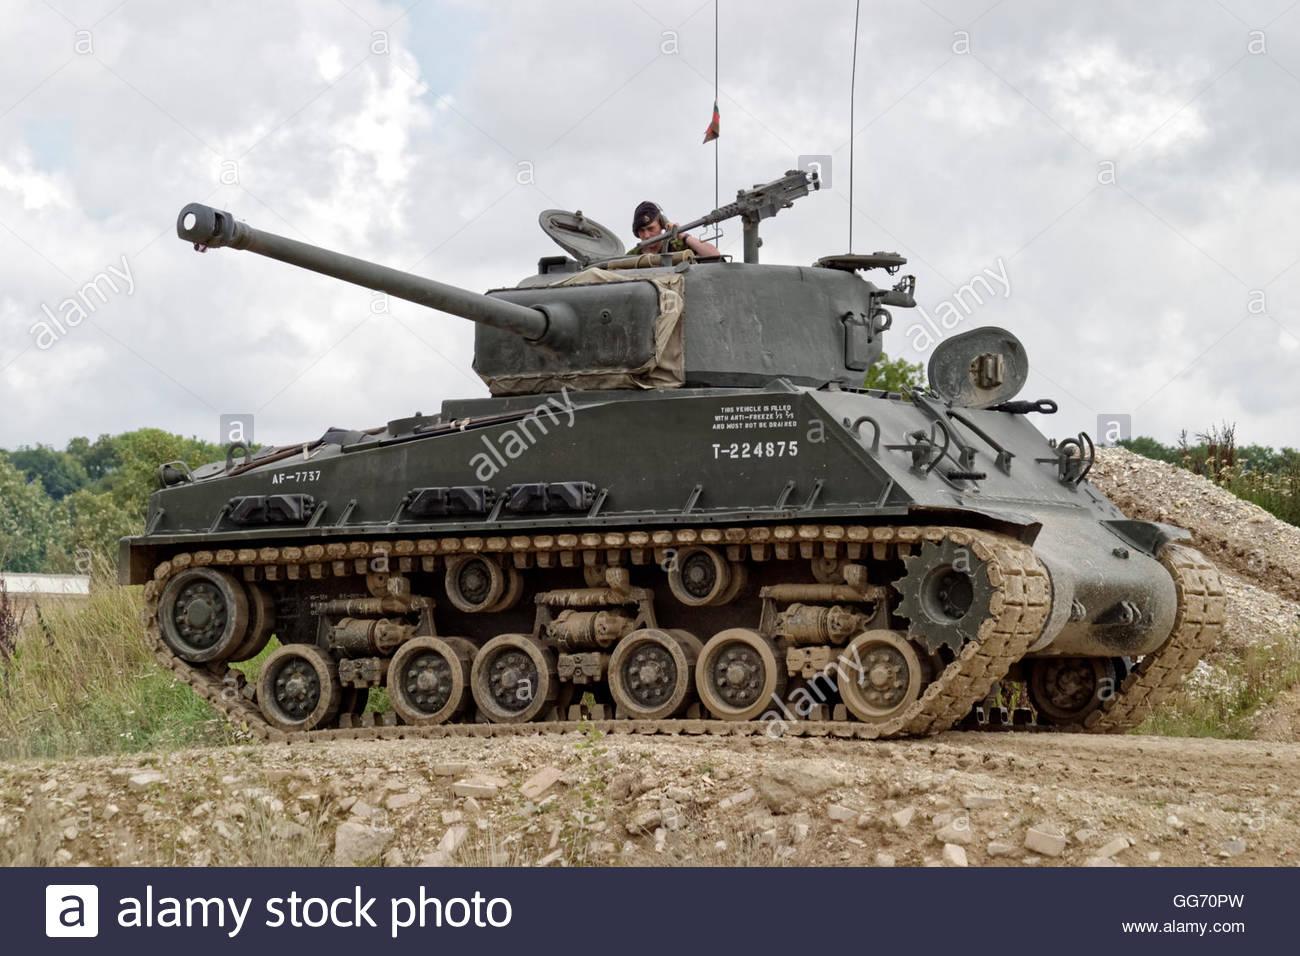 Click image for larger version  Name:an-m4a2-76-hvss-sherman-tank-at-the-tank-museum-bovington-dorset-united-GG70PW.jpg Views:40 Size:177.4 KB ID:2254708